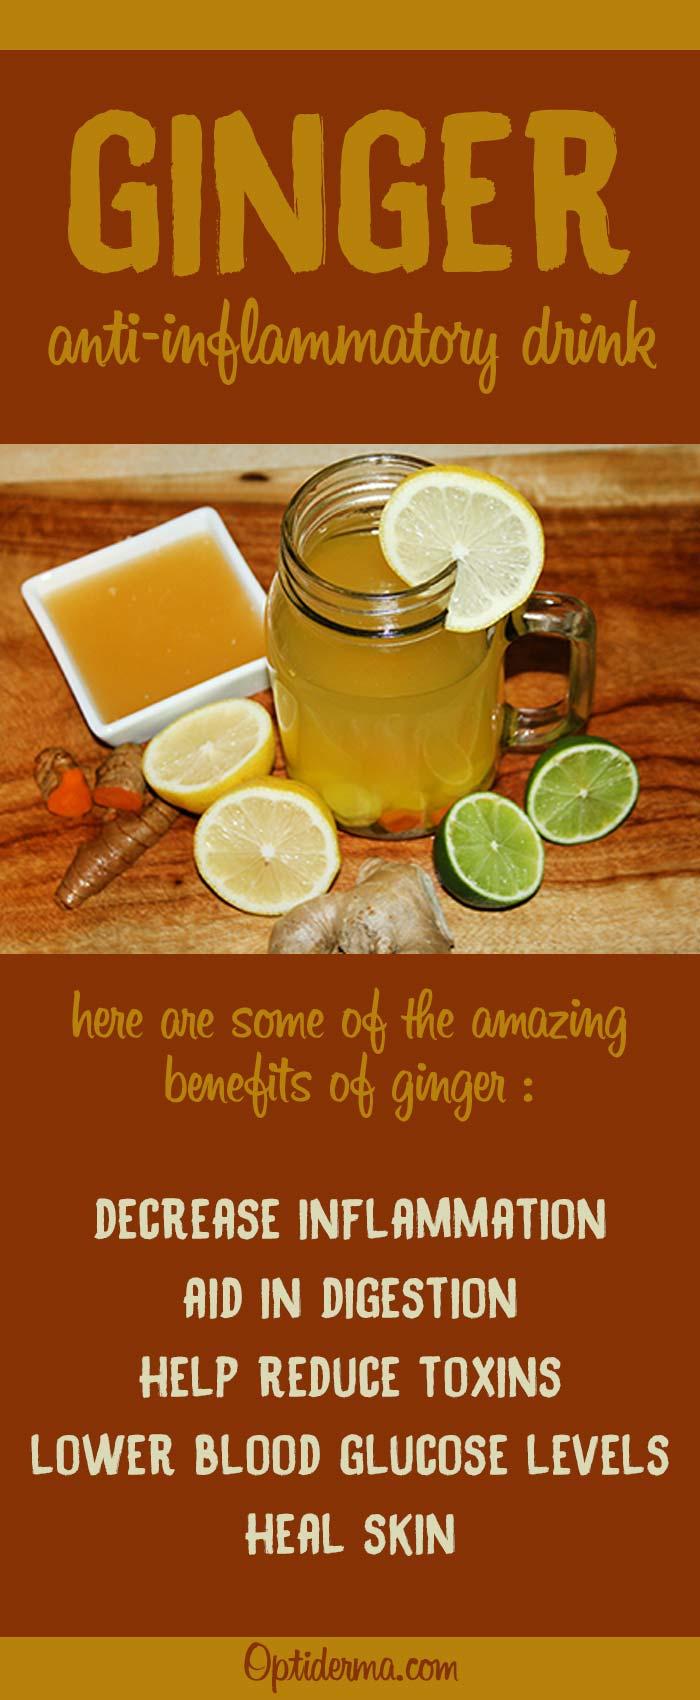 Ginger Anti-Inflammatory Drink